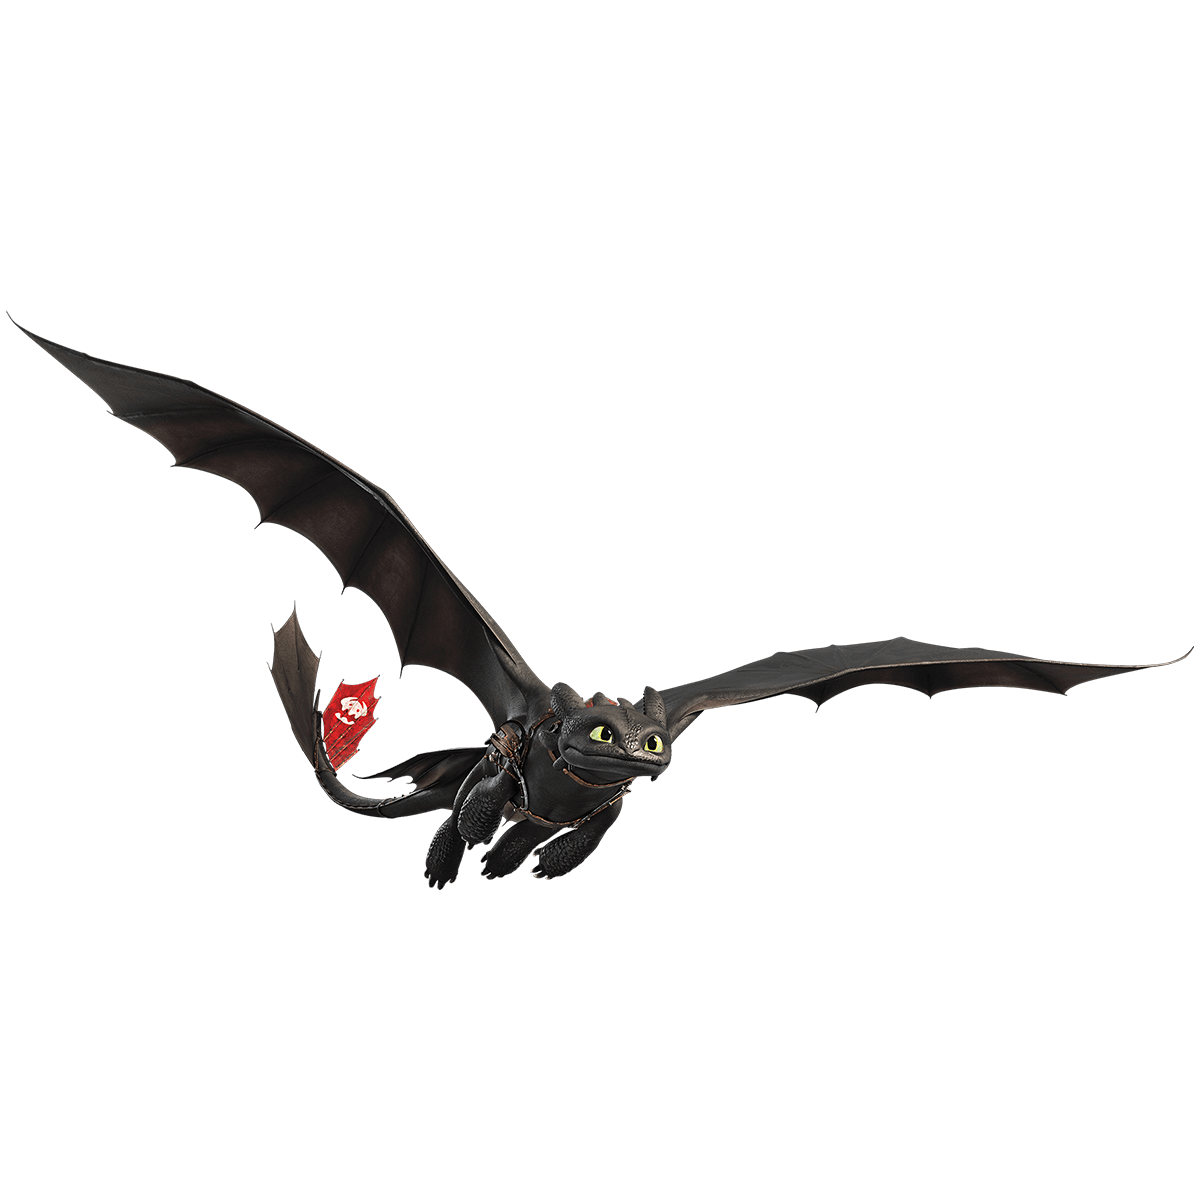 www dreamworks com/images/temp/explore/dragons/too